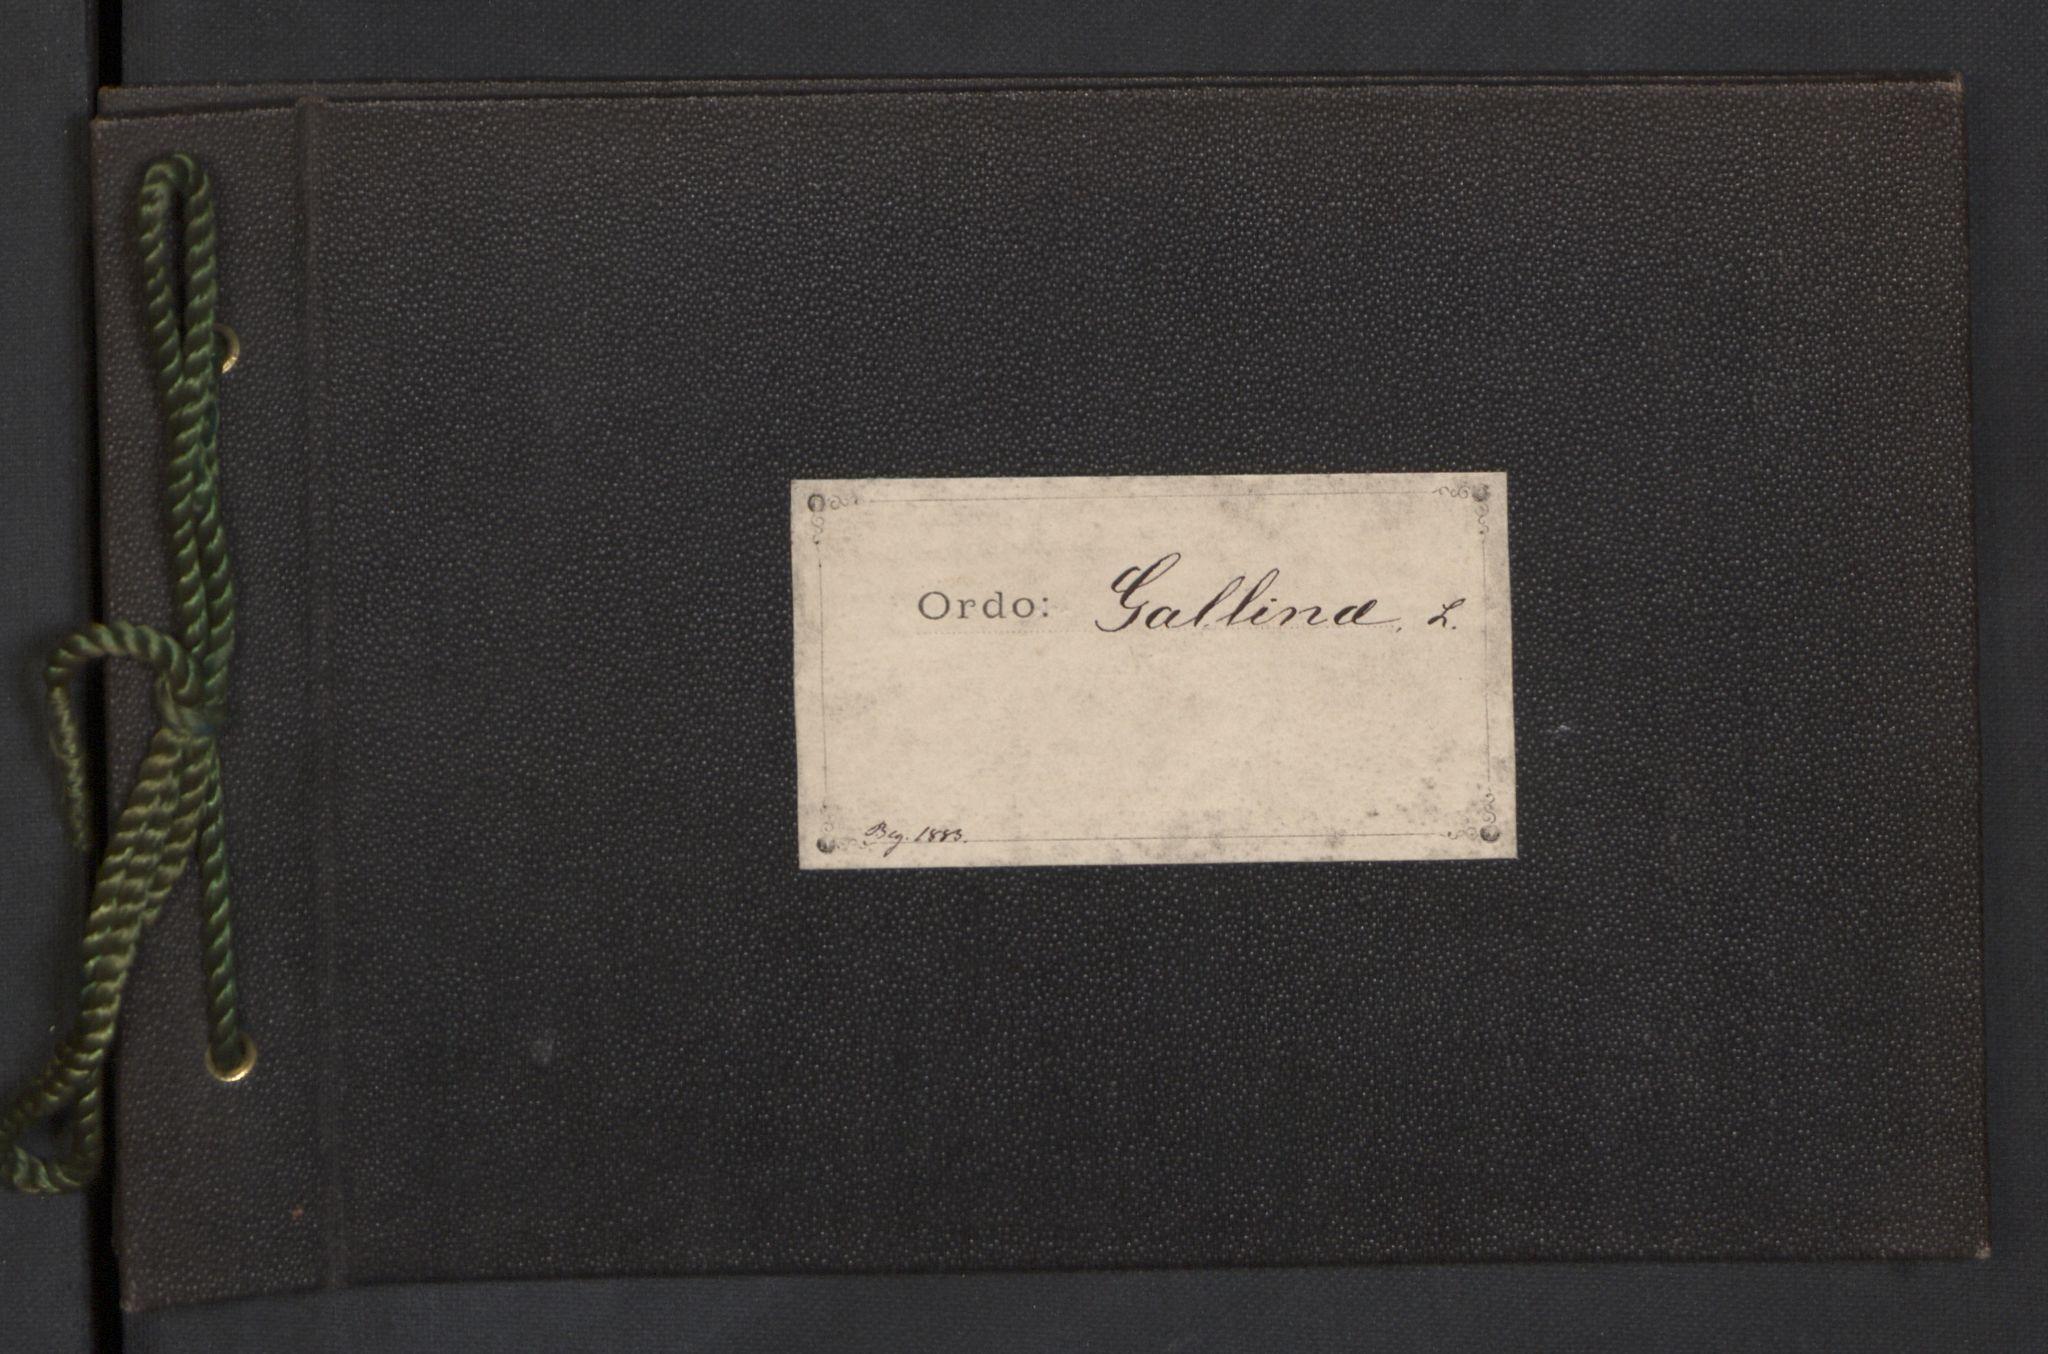 NHMO, Naturhistorisk museum (Oslo), 2: Fugl. Taksonomisk journal. Ordo: Gallina